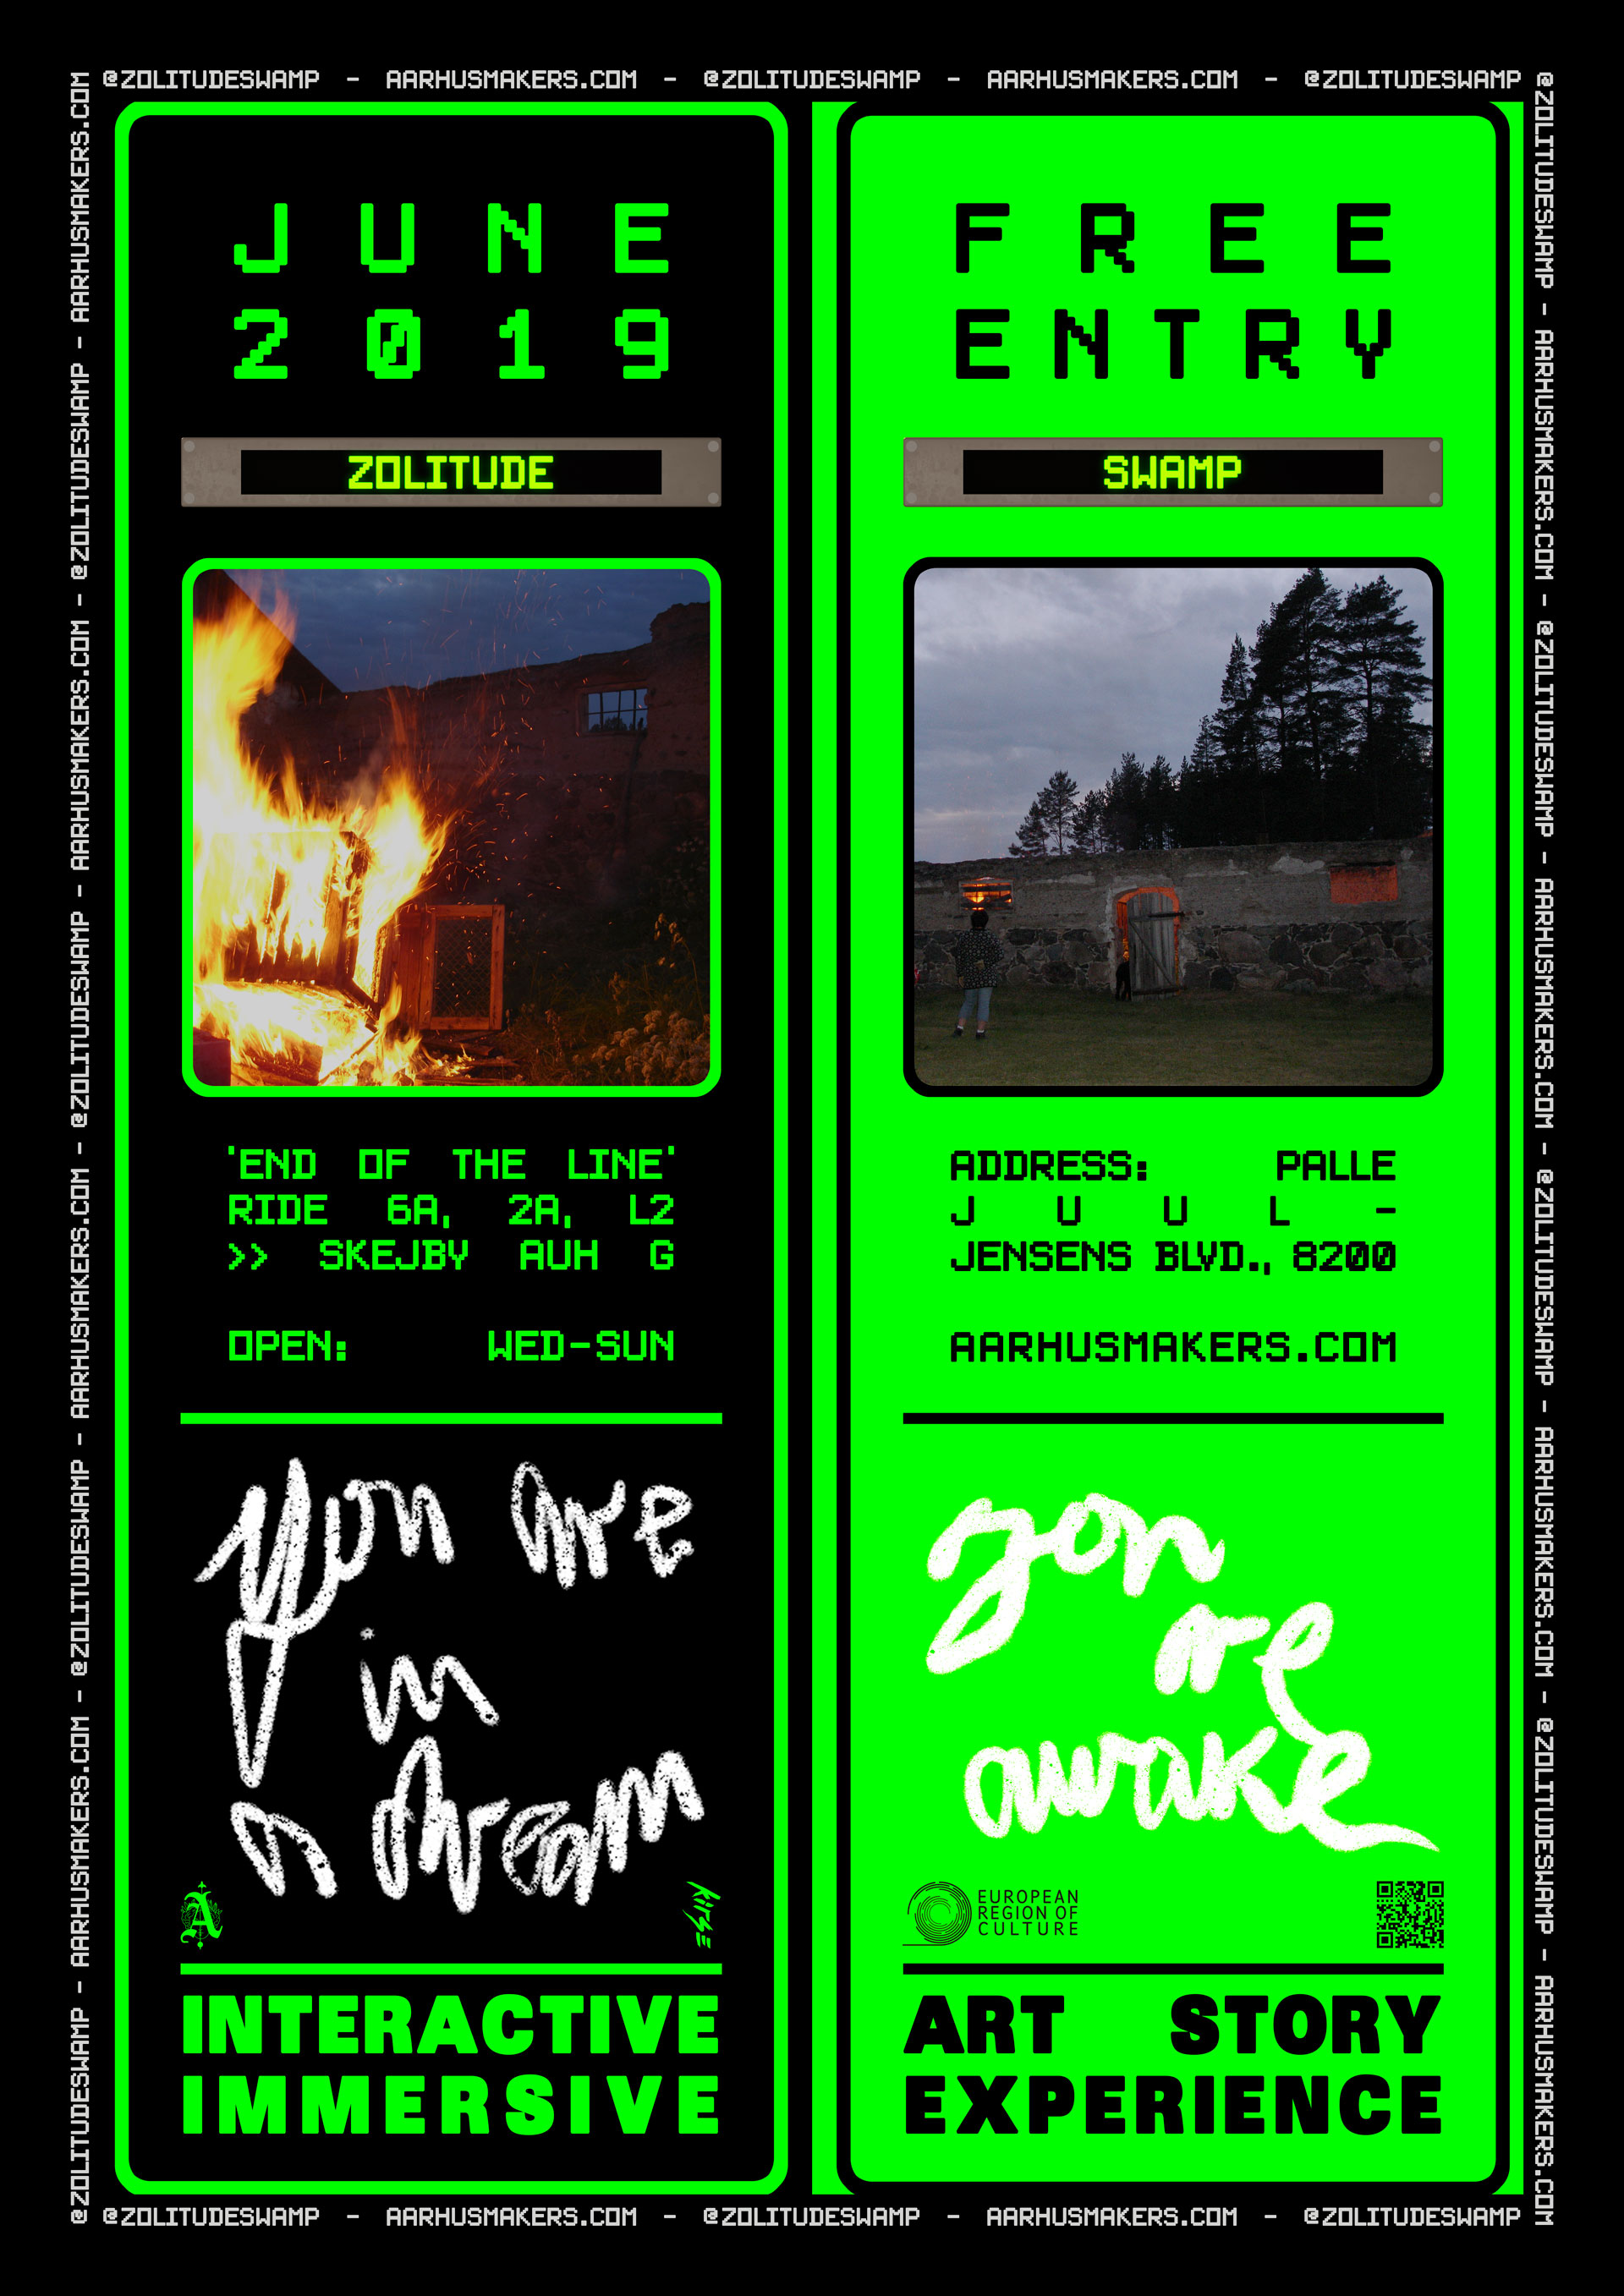 Zolitude-Swamp-PR-poster-you-are-awake.jpg